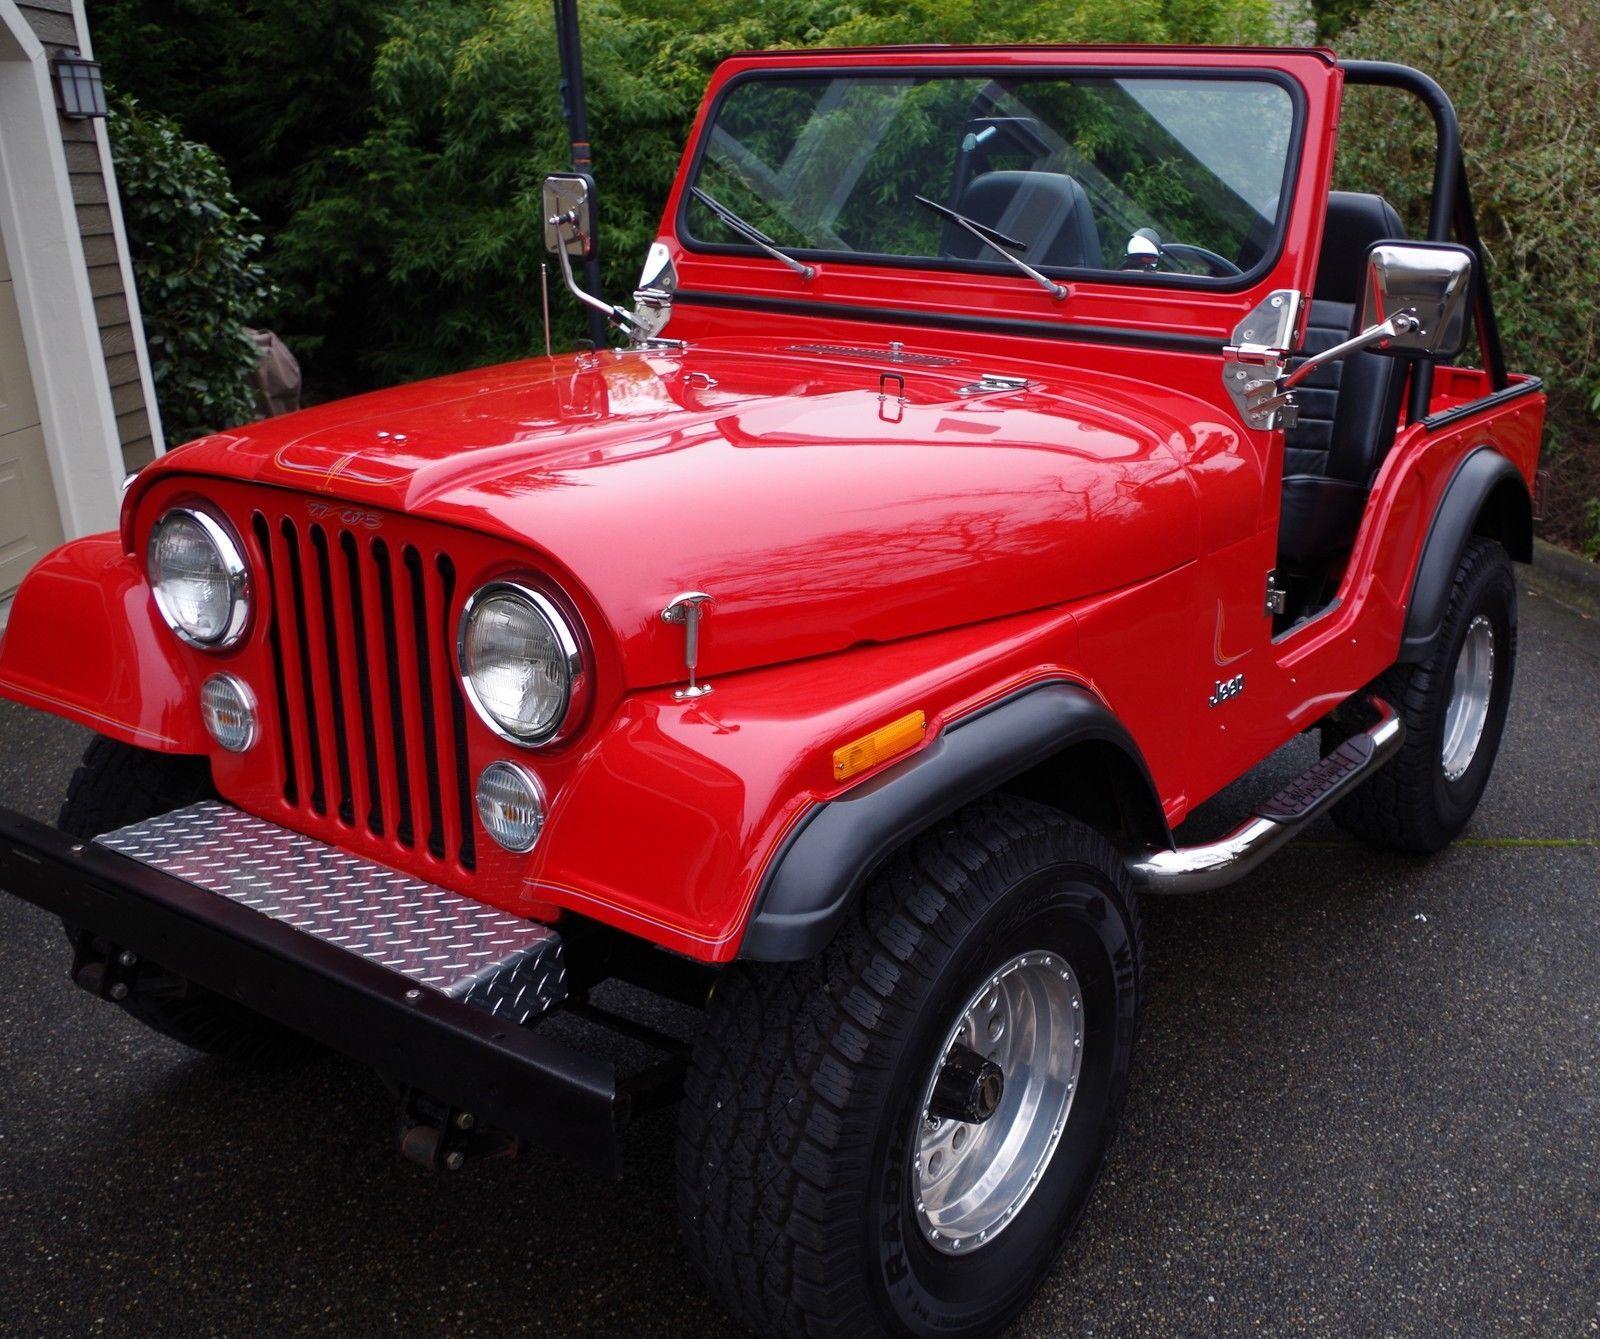 Pin By Chuck Clarke On Cool Classic 4x4 S Dude Jeep Cj Jeep Cj5 Vintage Jeep